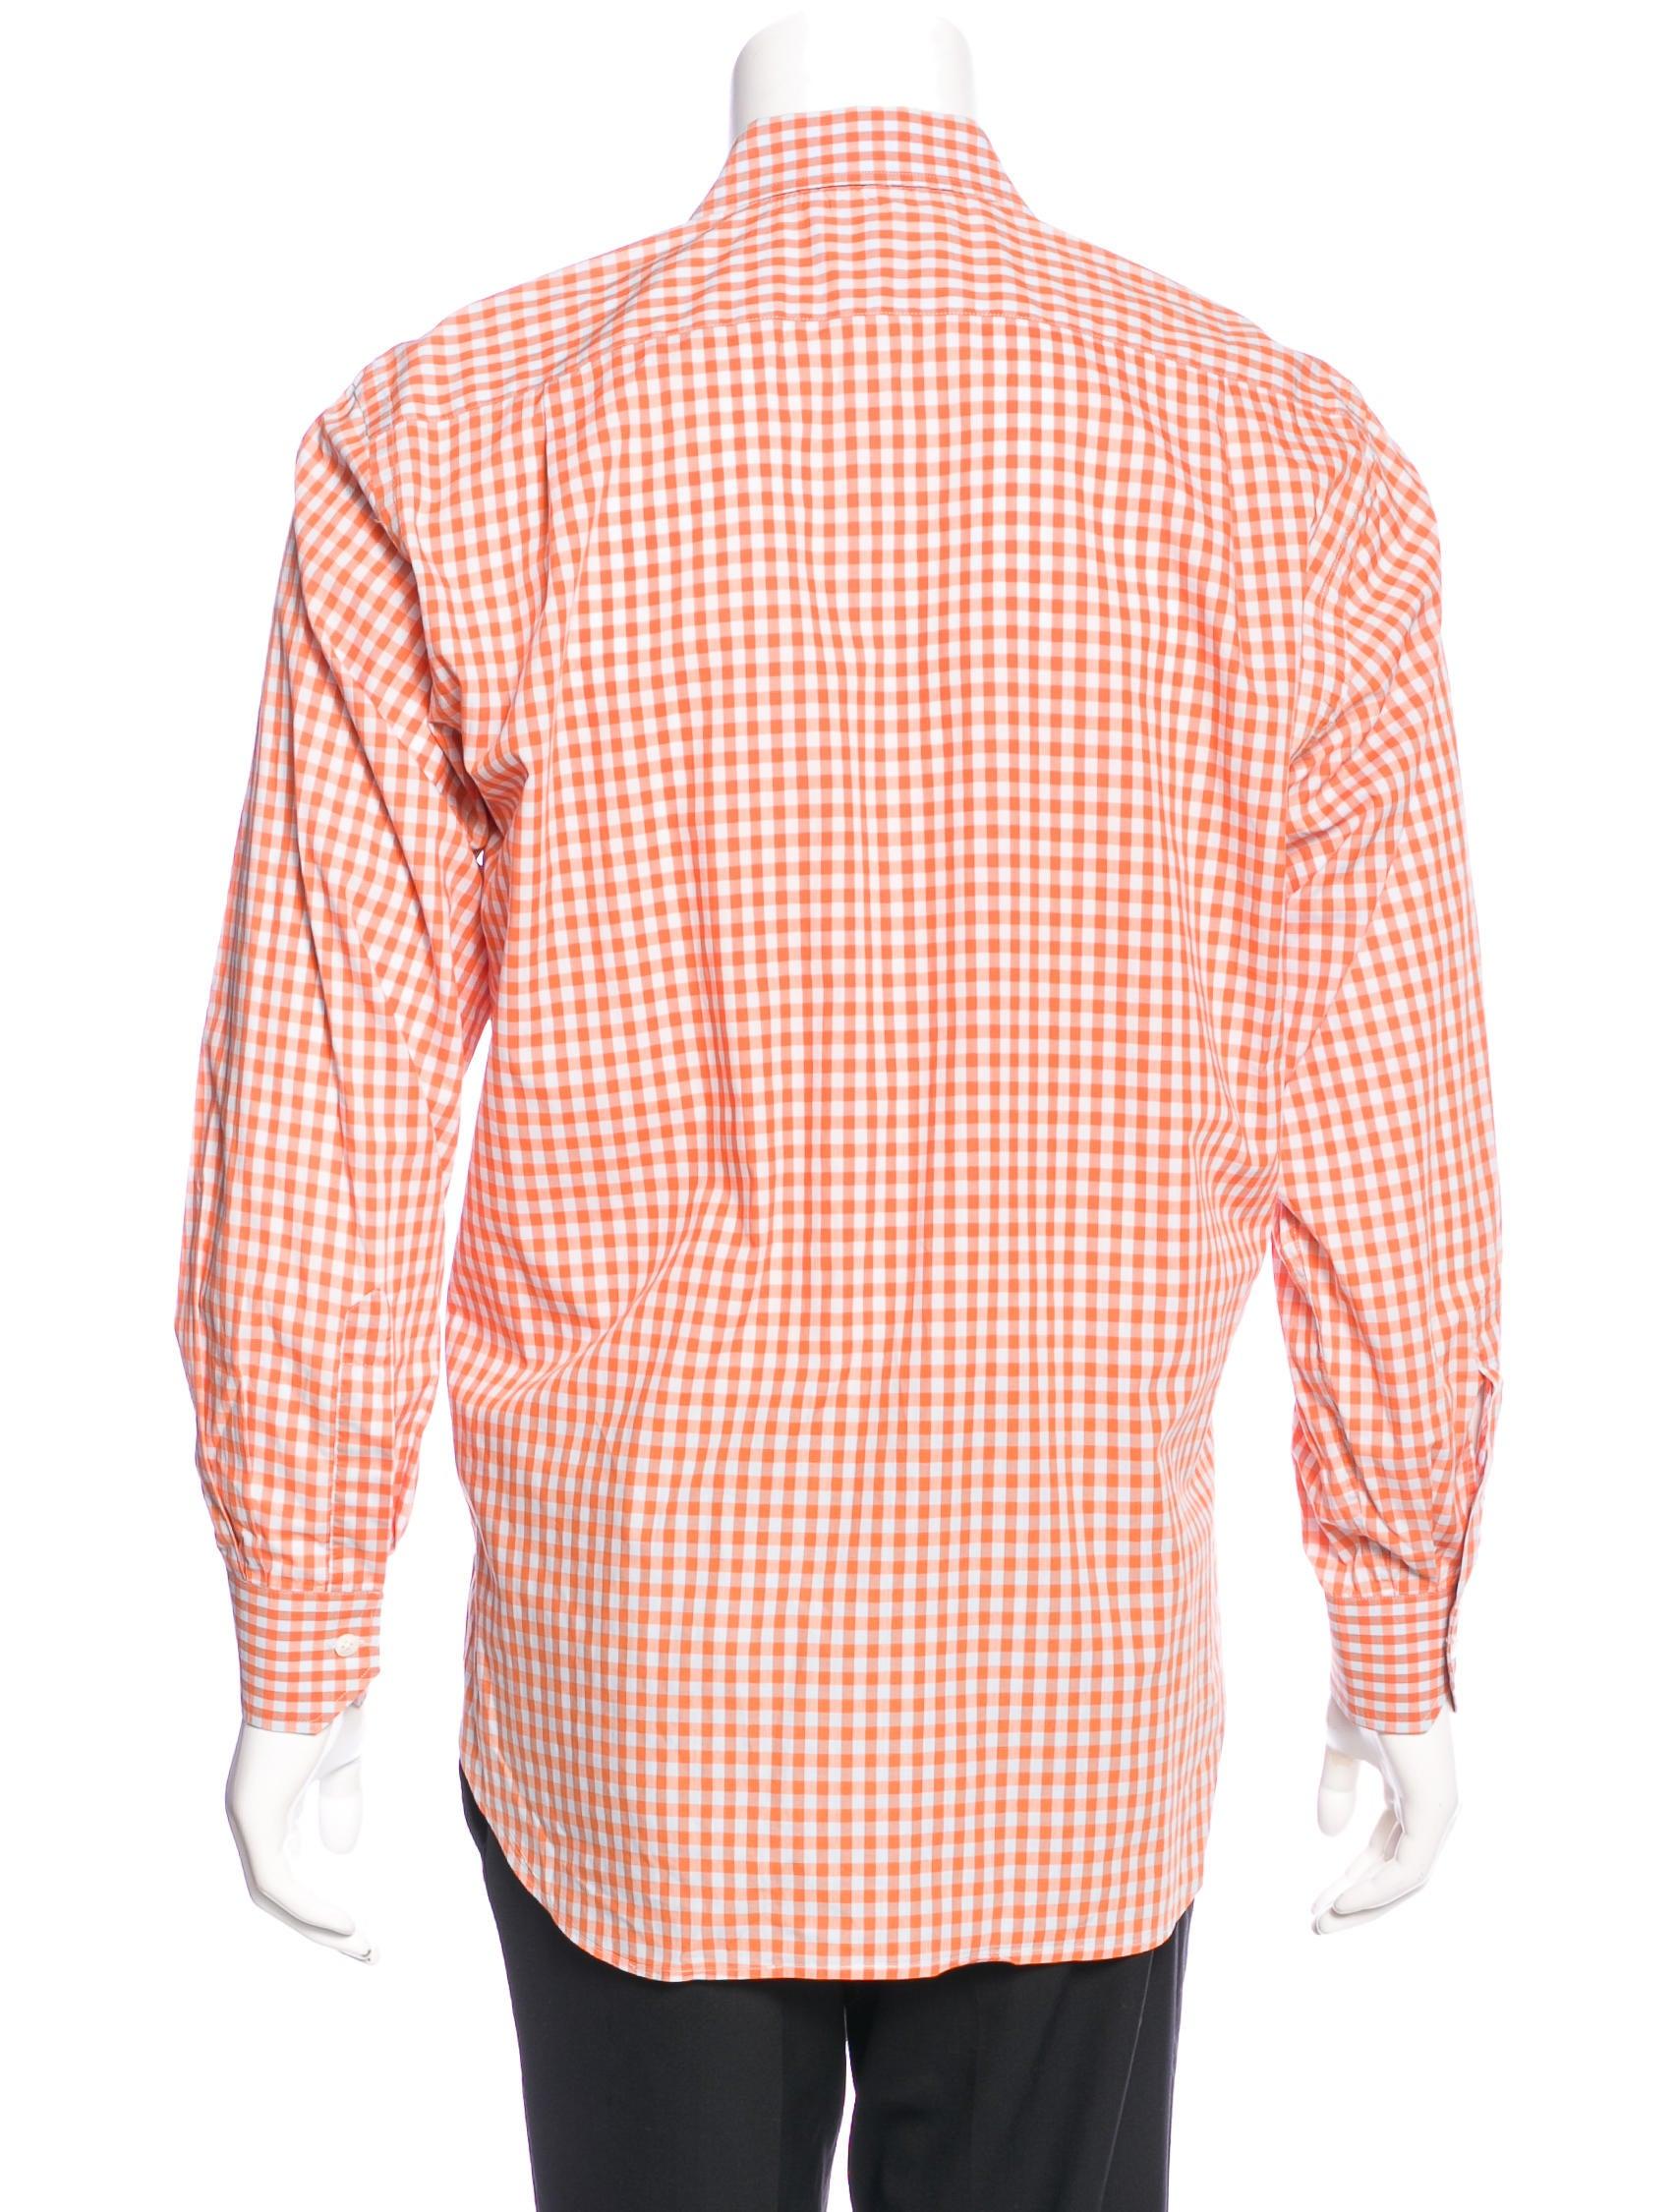 Etro gingham dress shirt clothing etr43907 the realreal for Gingham dress shirt men